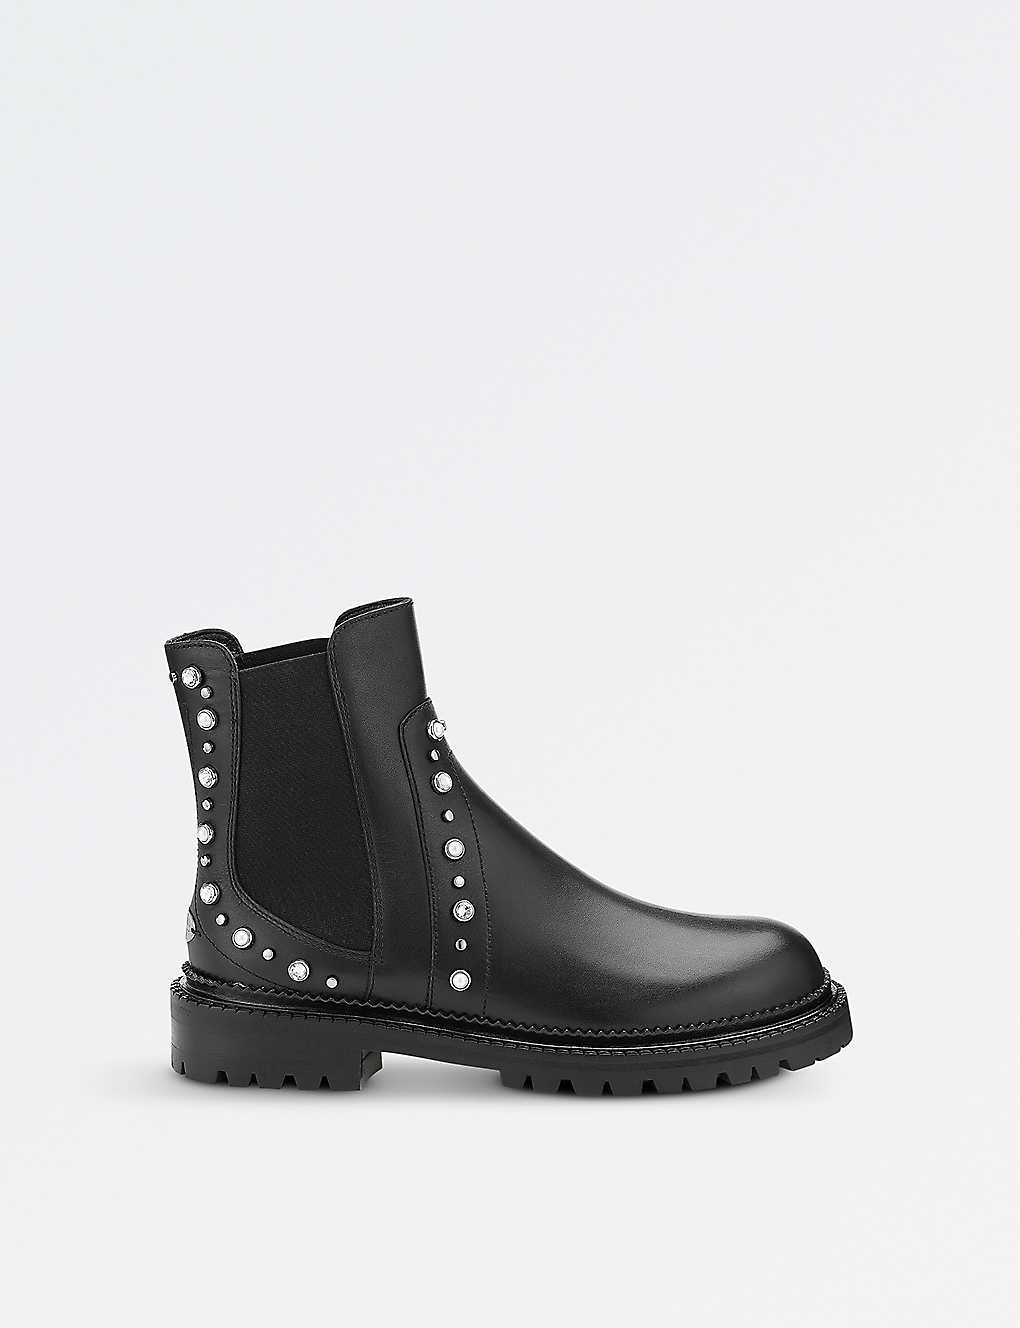 3c7de2694d57 JIMMY CHOO - Burrow flat leather biker boots